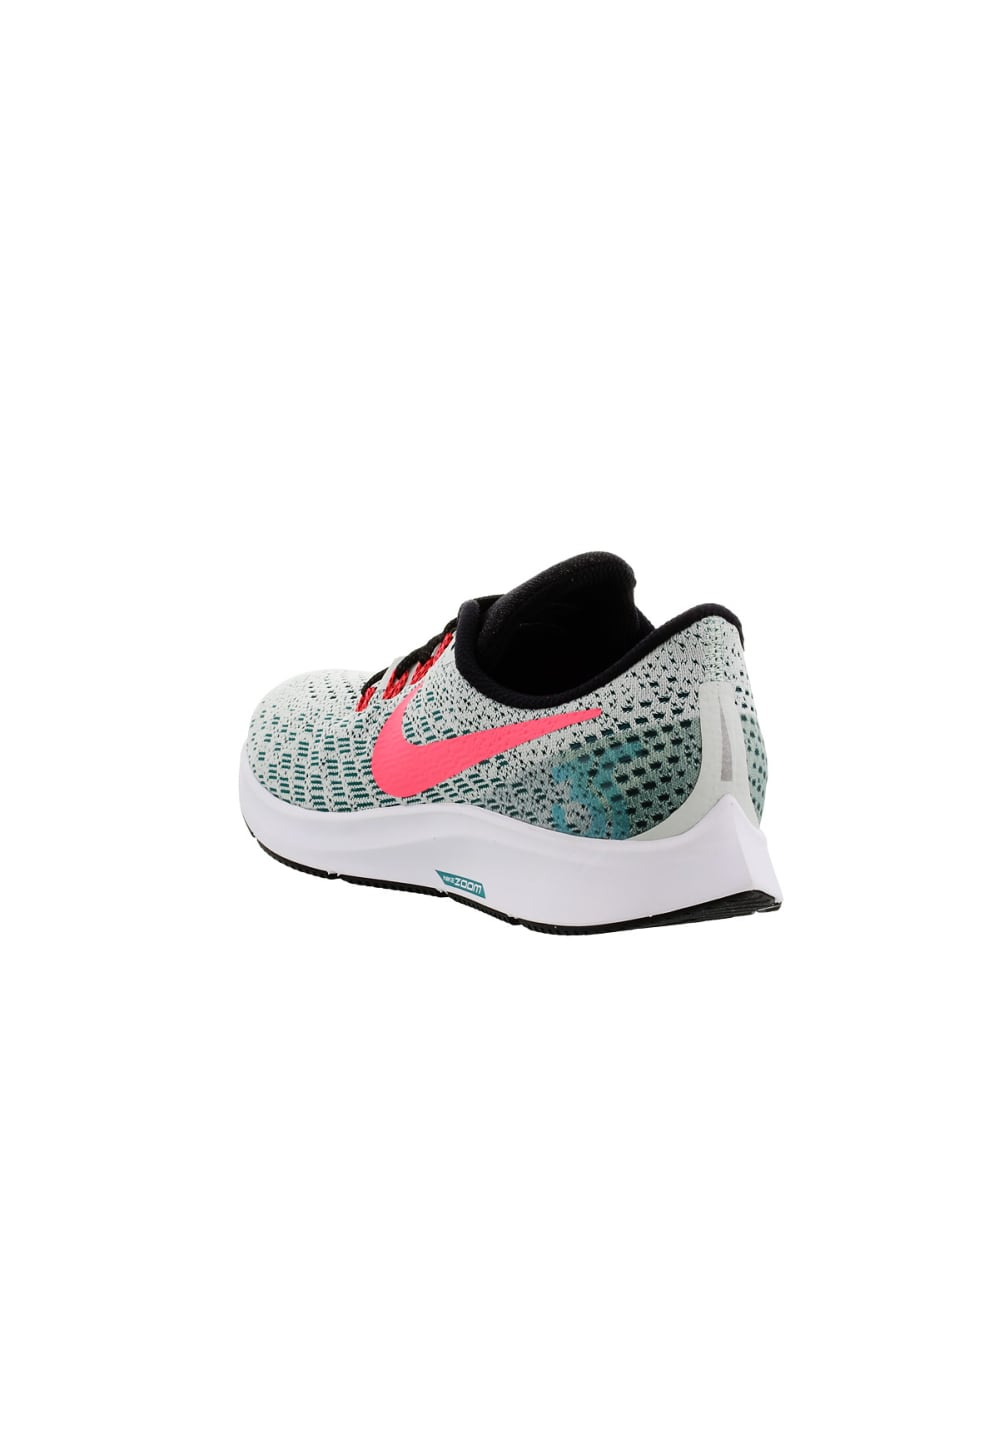 Gris Nike Air Femme Pegasus Zoom 35 Chaussures Running Pour EDH29I